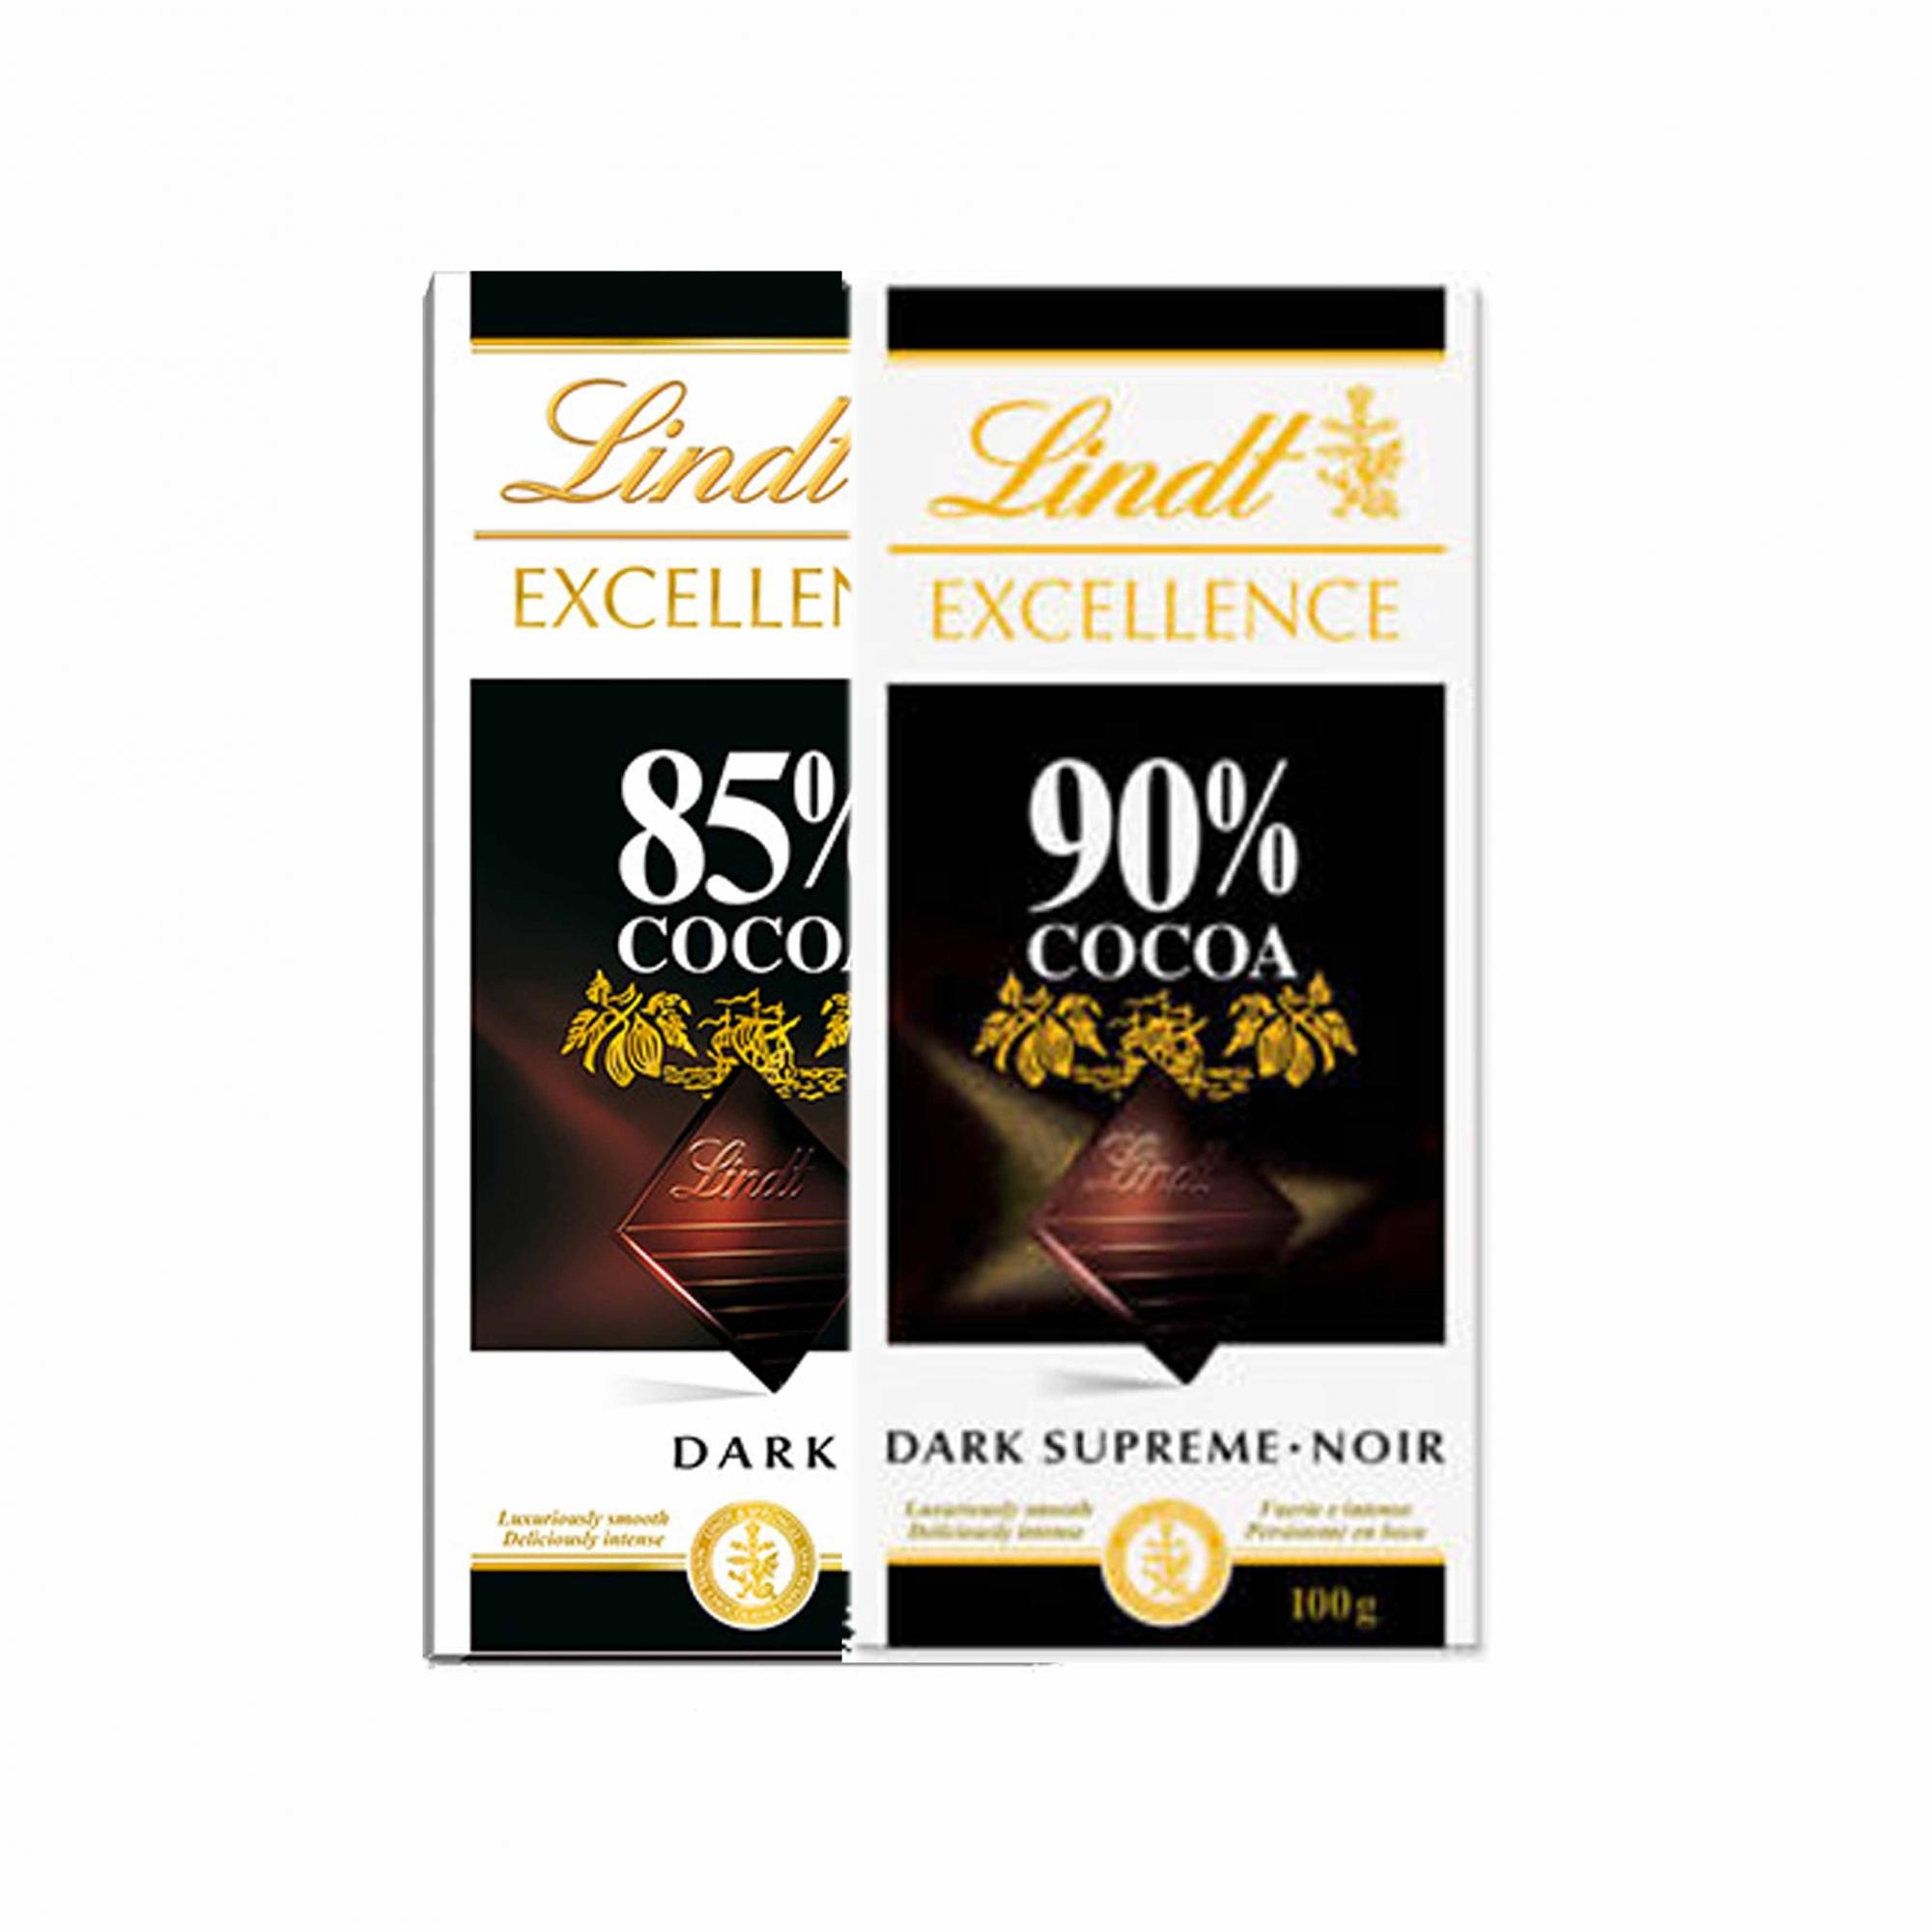 Kit 2x Barra de chocolate Lindt Excellence 85% e 90% Amargo 100g Dark